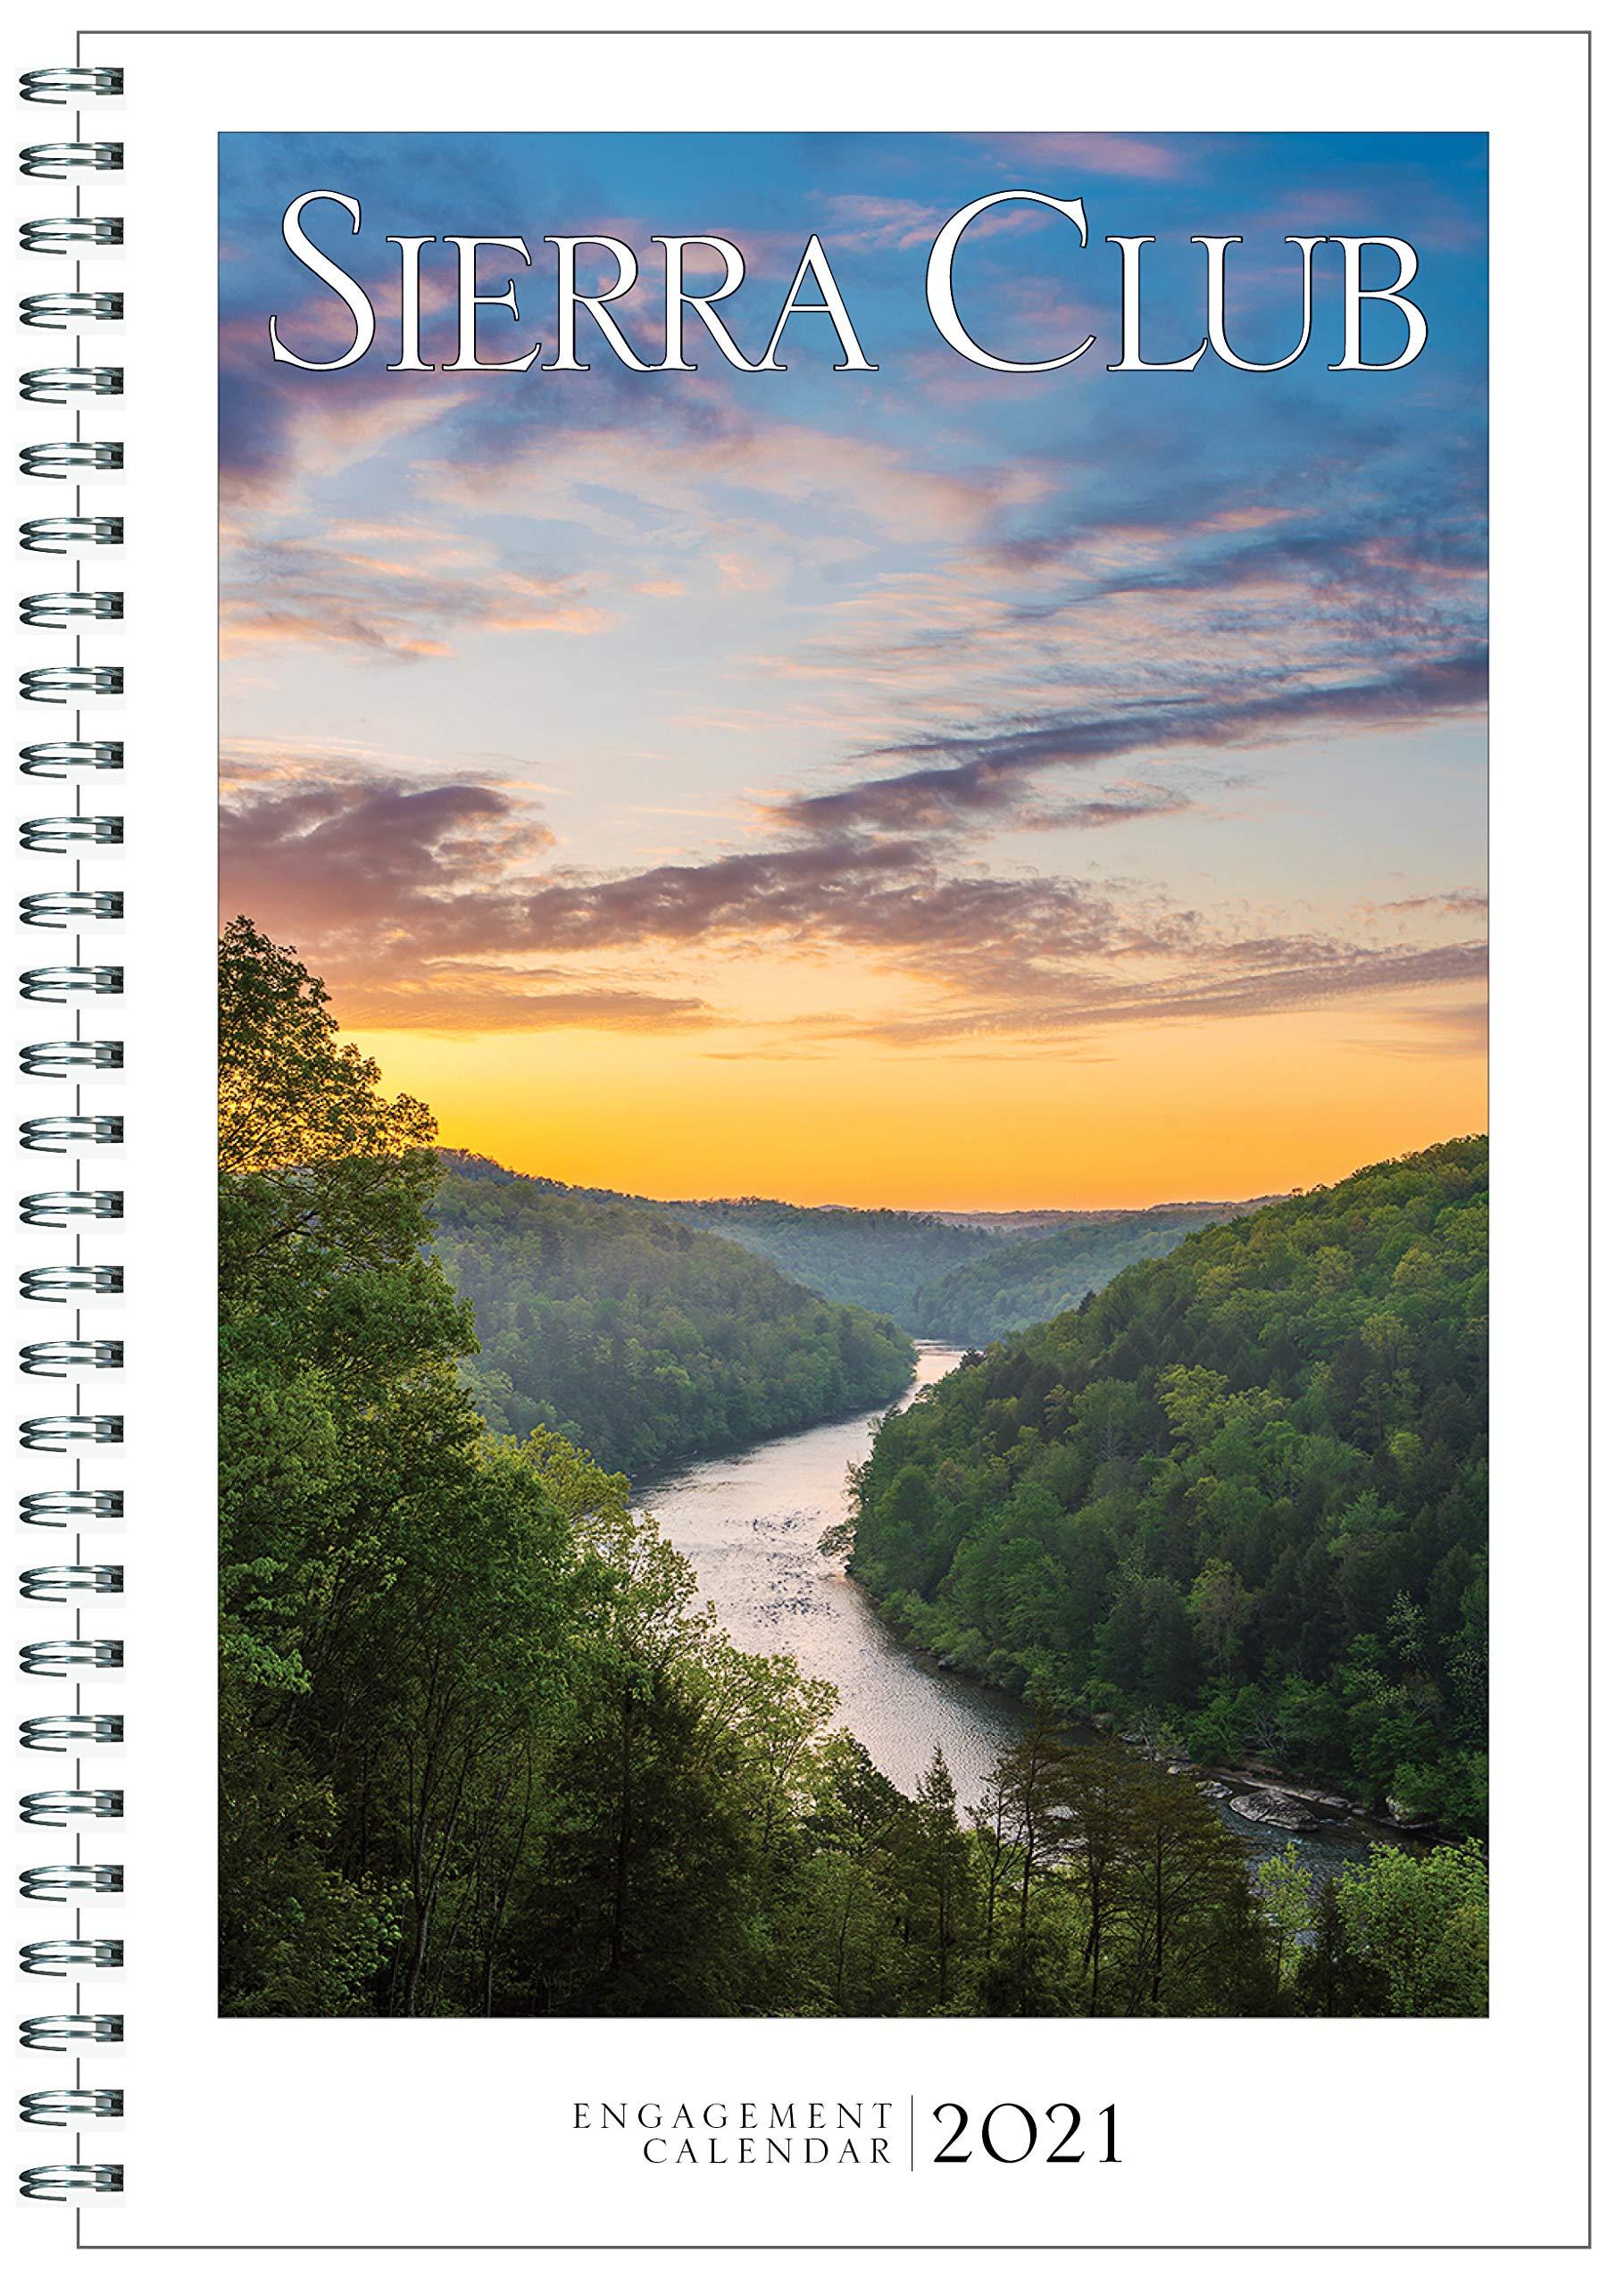 2021 Engagement Calendar Sierra Club Engagement Calendar 2021: Sierra Club: 9781578052288